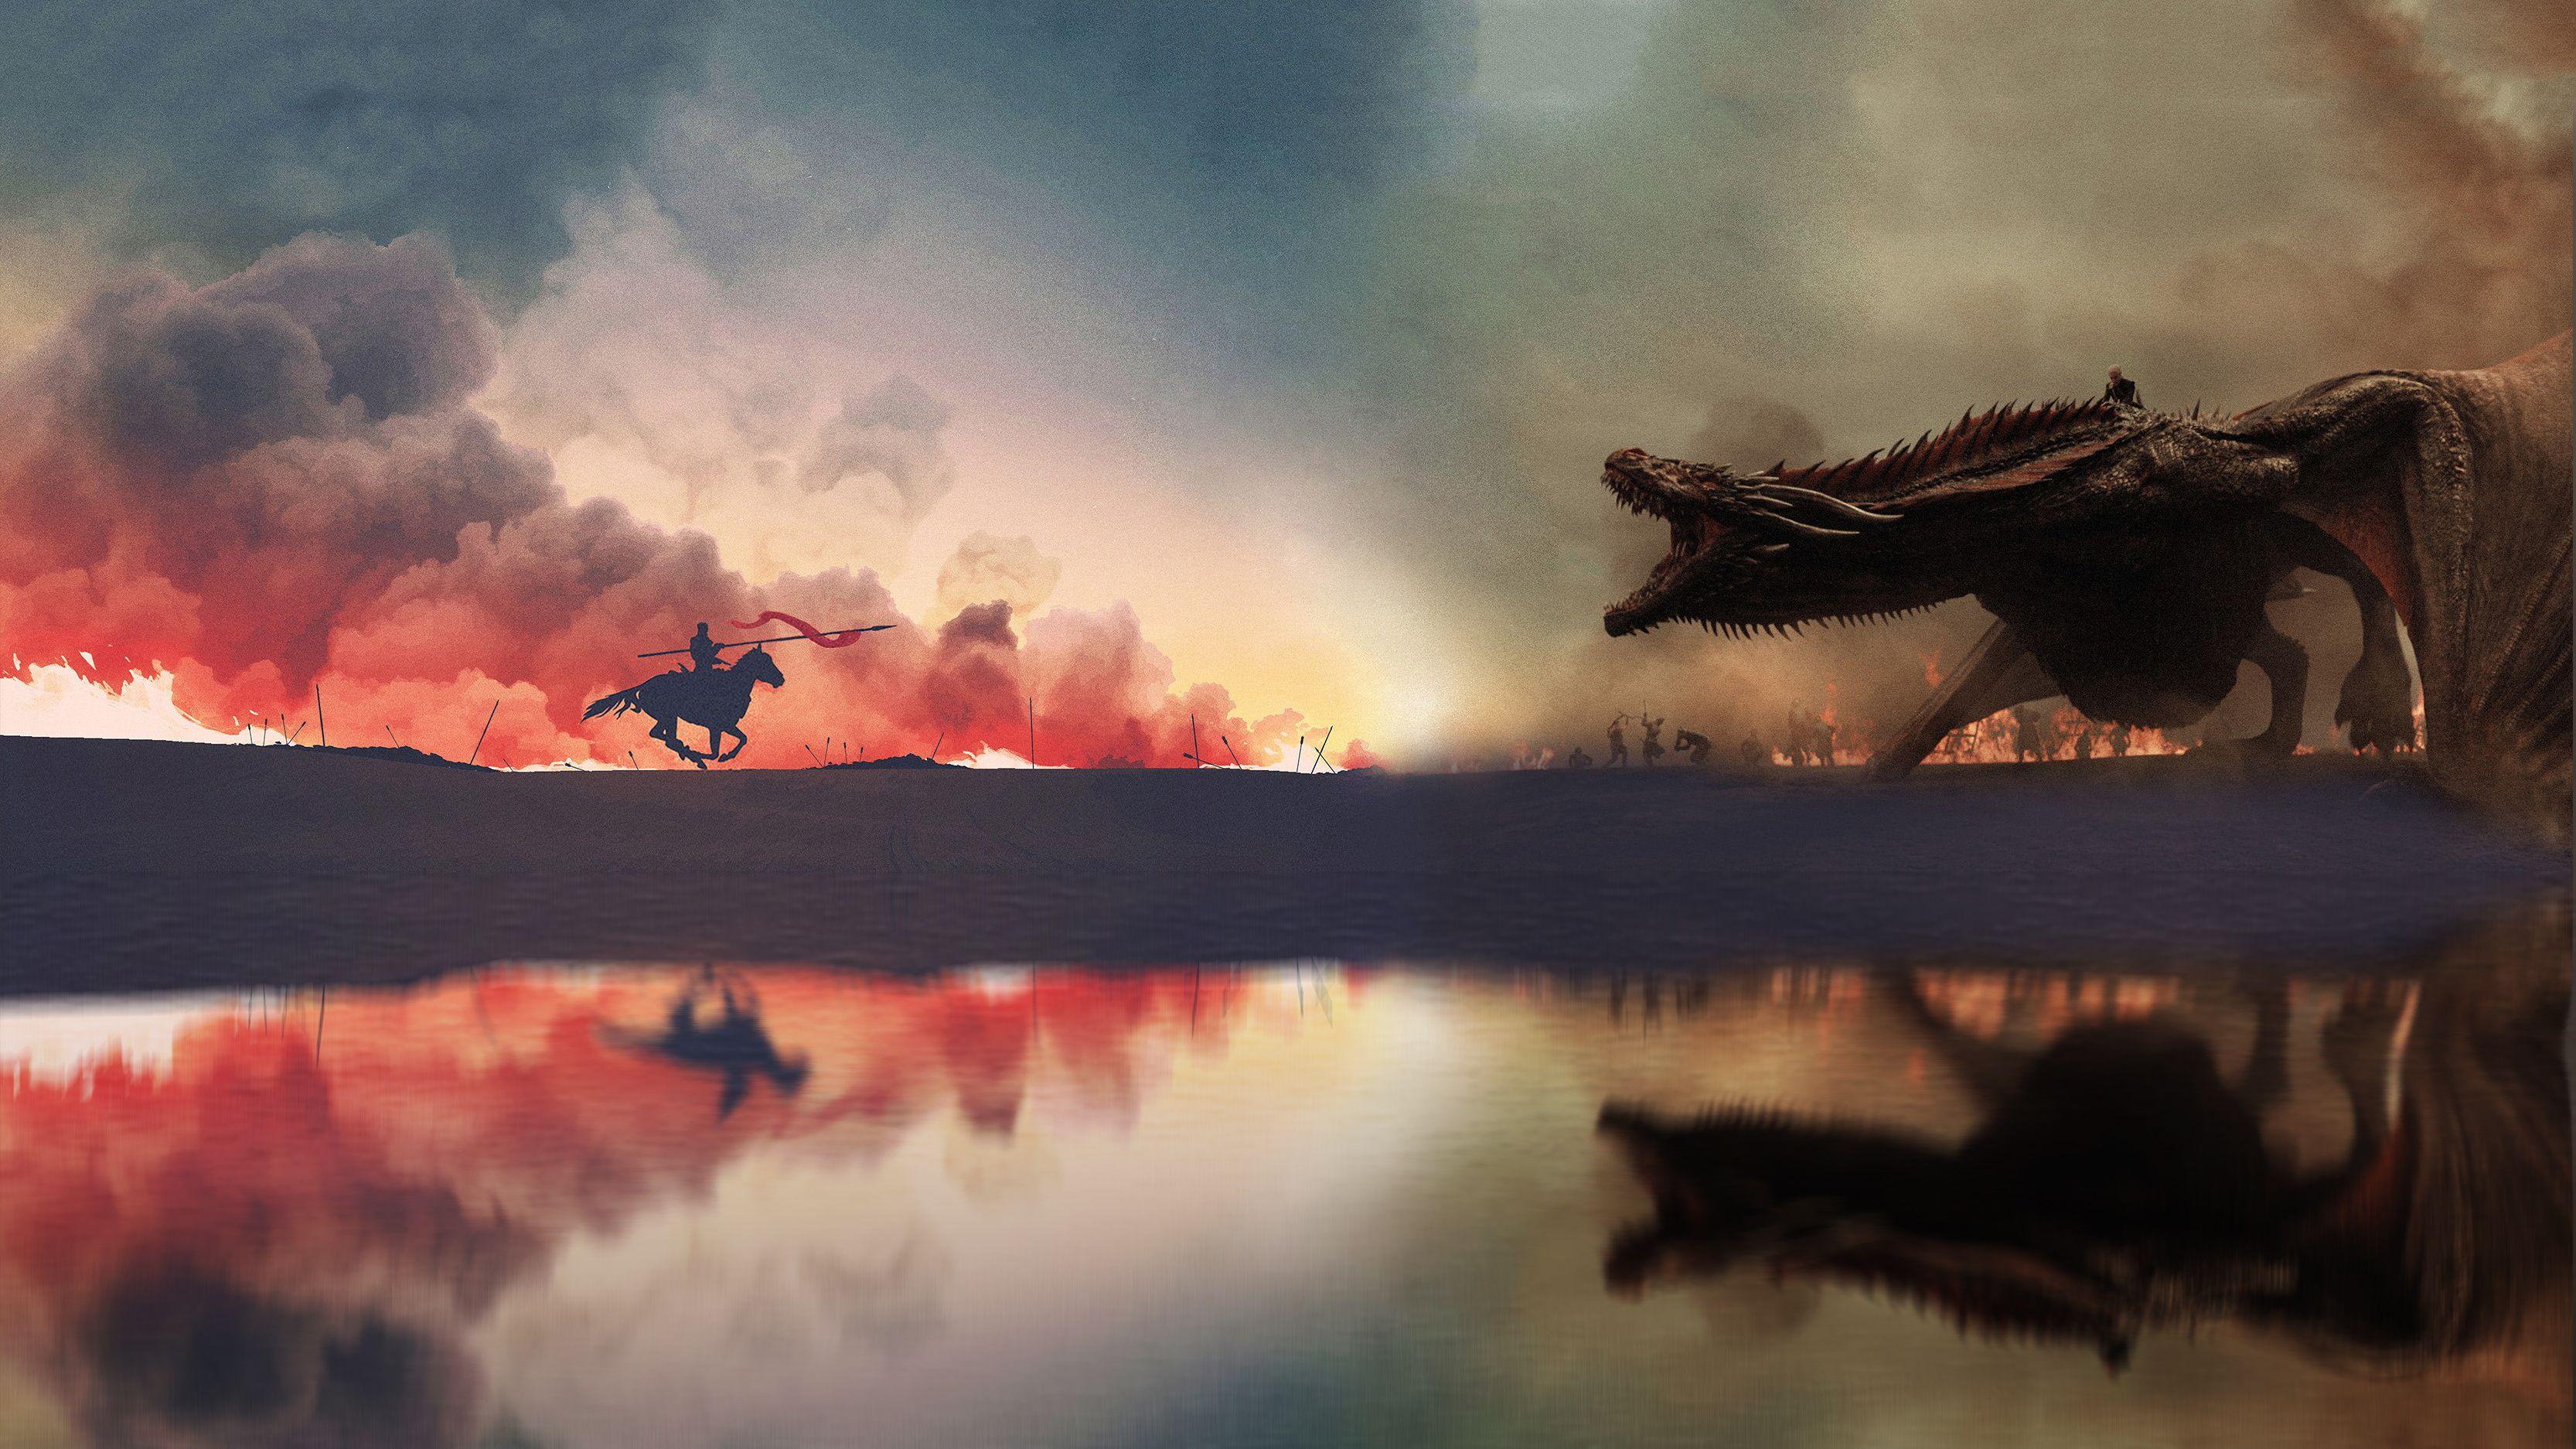 Game Of Thrones War Has Started Artwork 4k 6v Ultra Hd Wallpaper 3332x1874